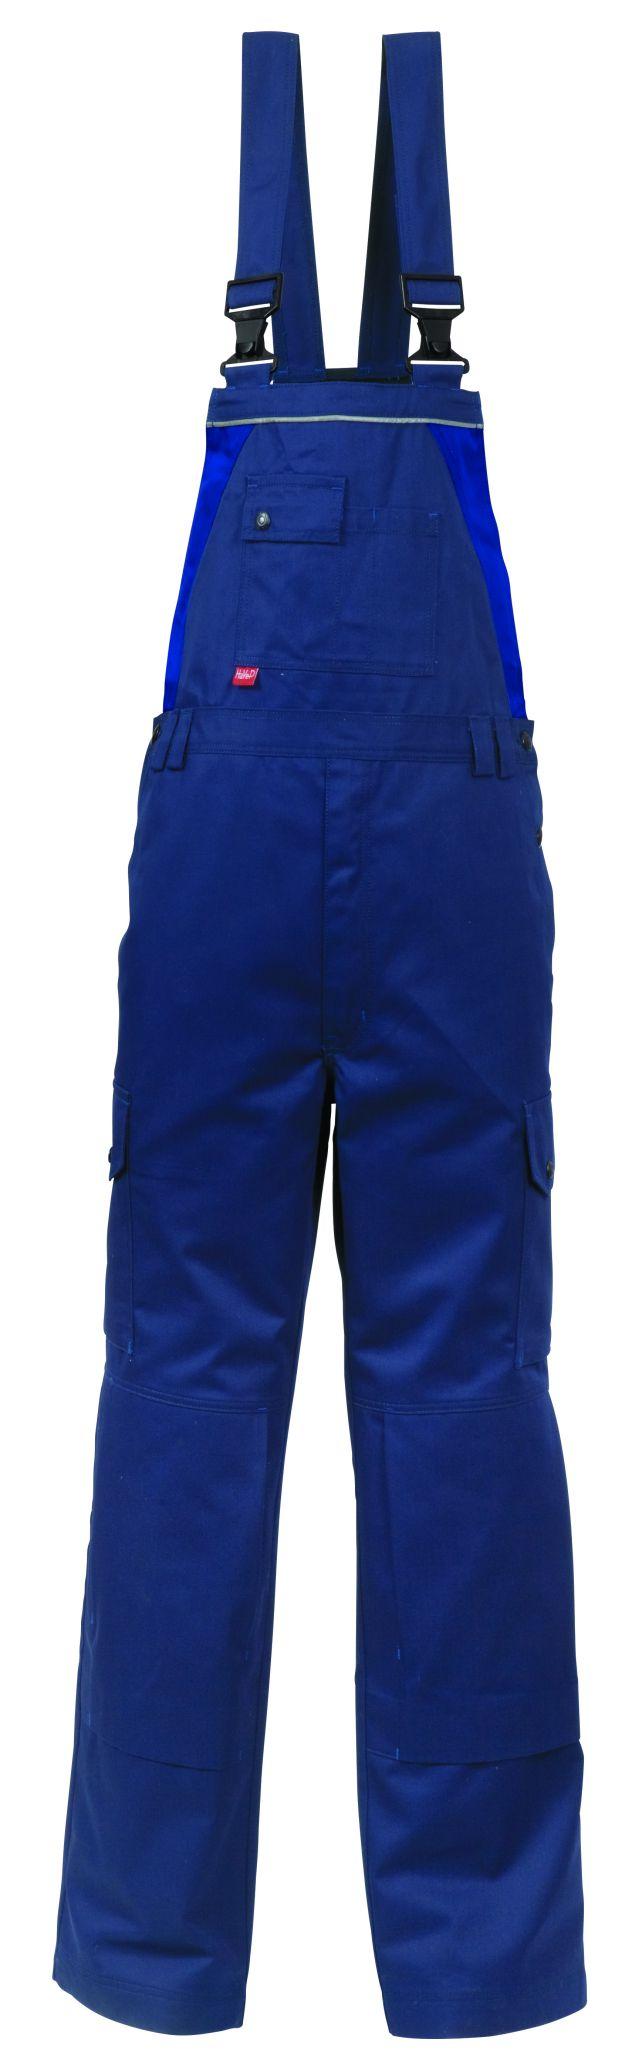 HaVeP Workwear/Protective wear Amerikaanse overall/Bretelbroek 20005